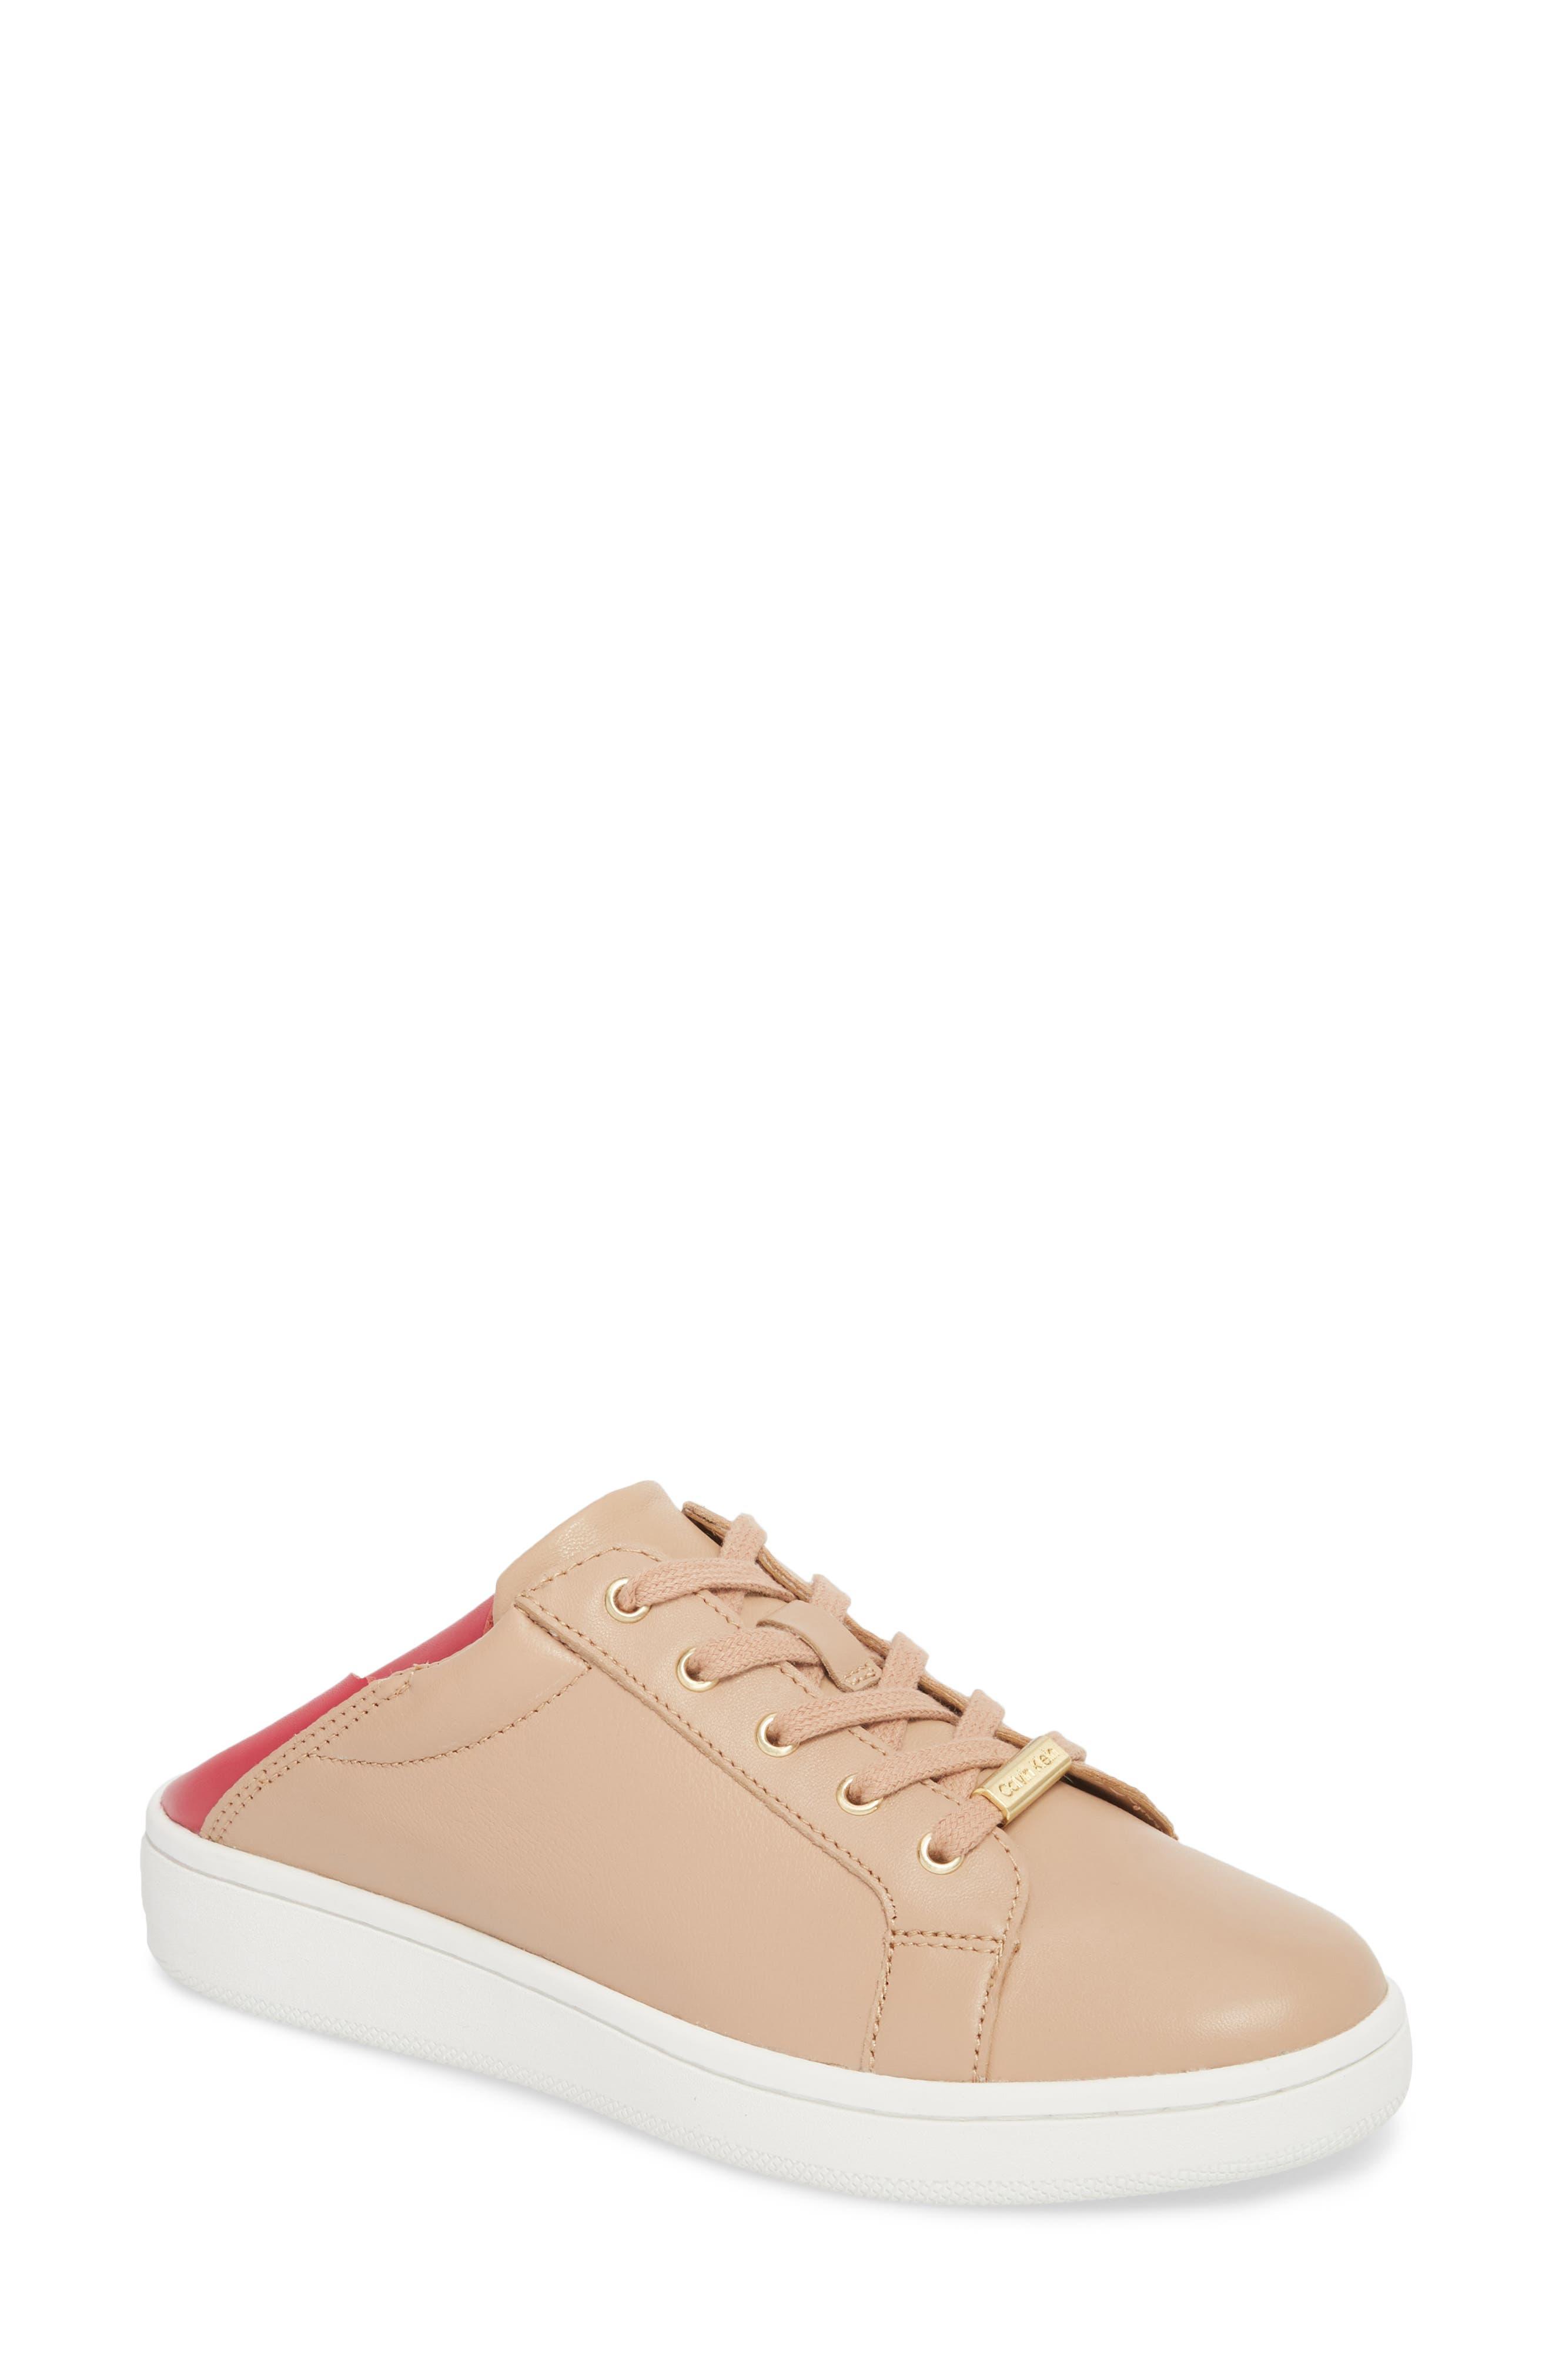 Danica Convertible Sneaker,                         Main,                         color, Desert Sand Leather